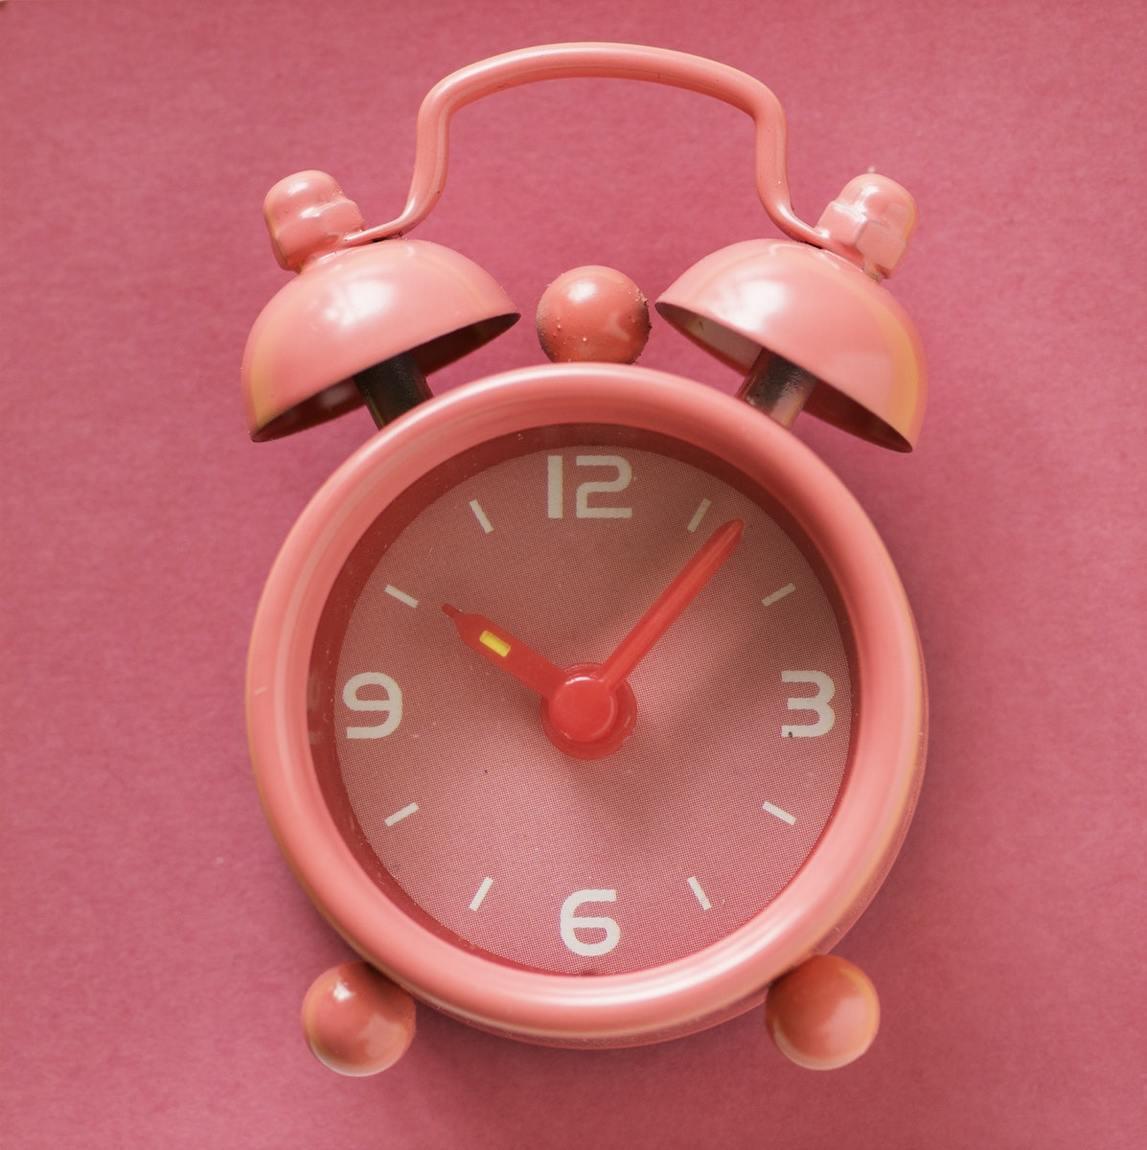 Clock ticking big